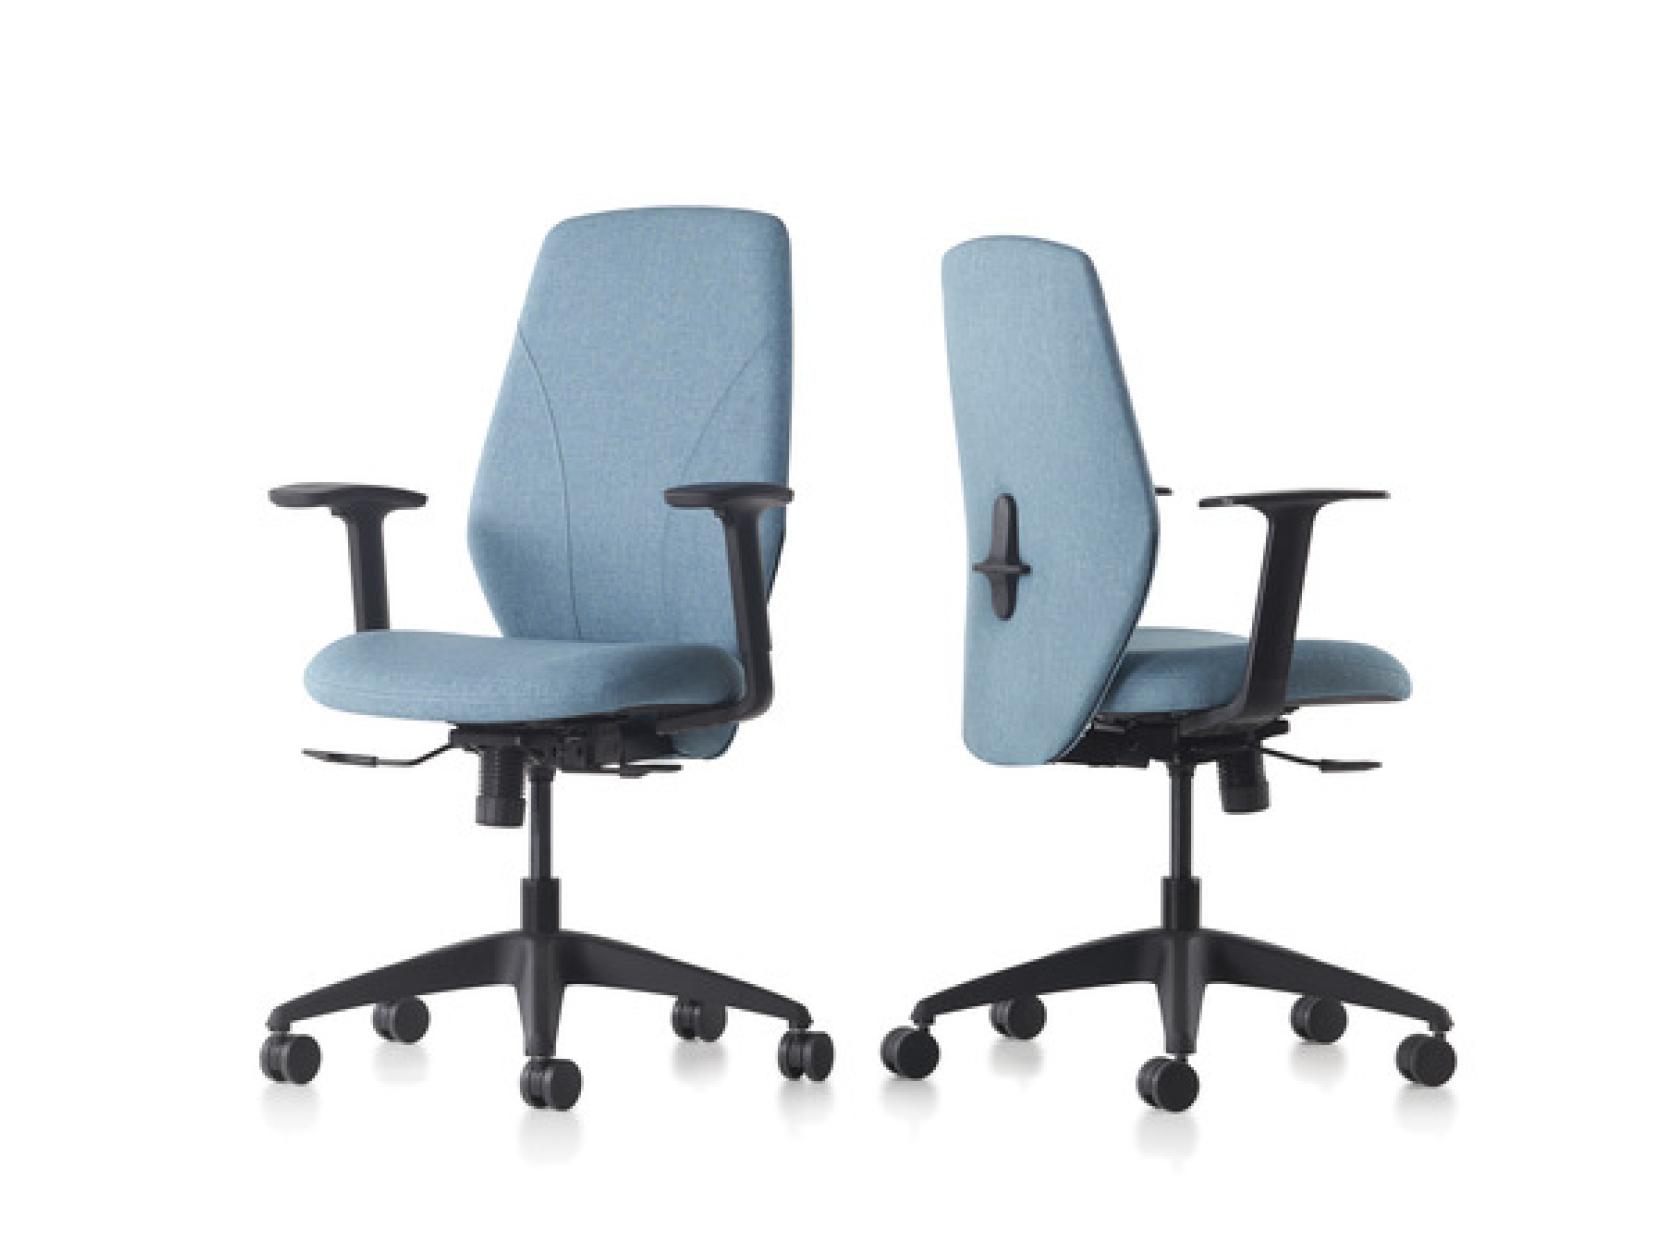 POSH Helm Chair lightweight with diamond shaped backrest